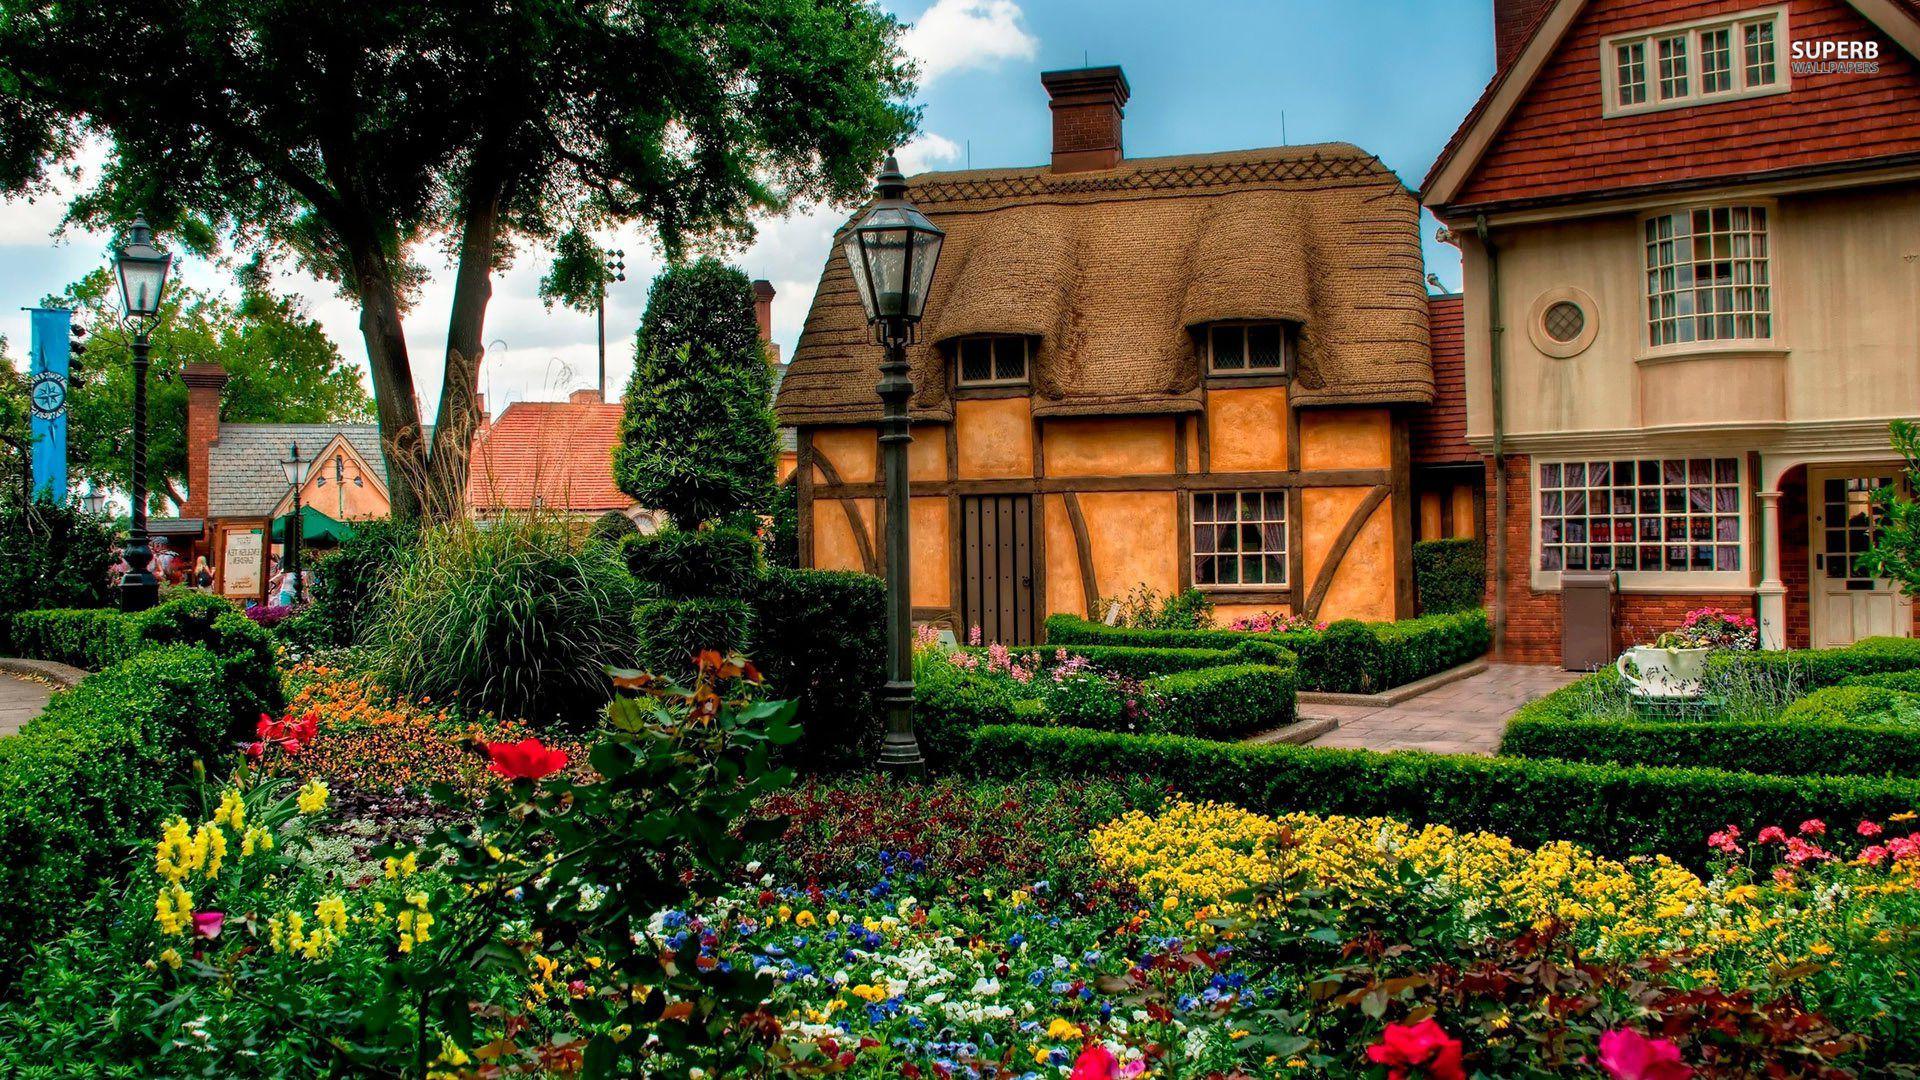 Colorful garden behind old cottage